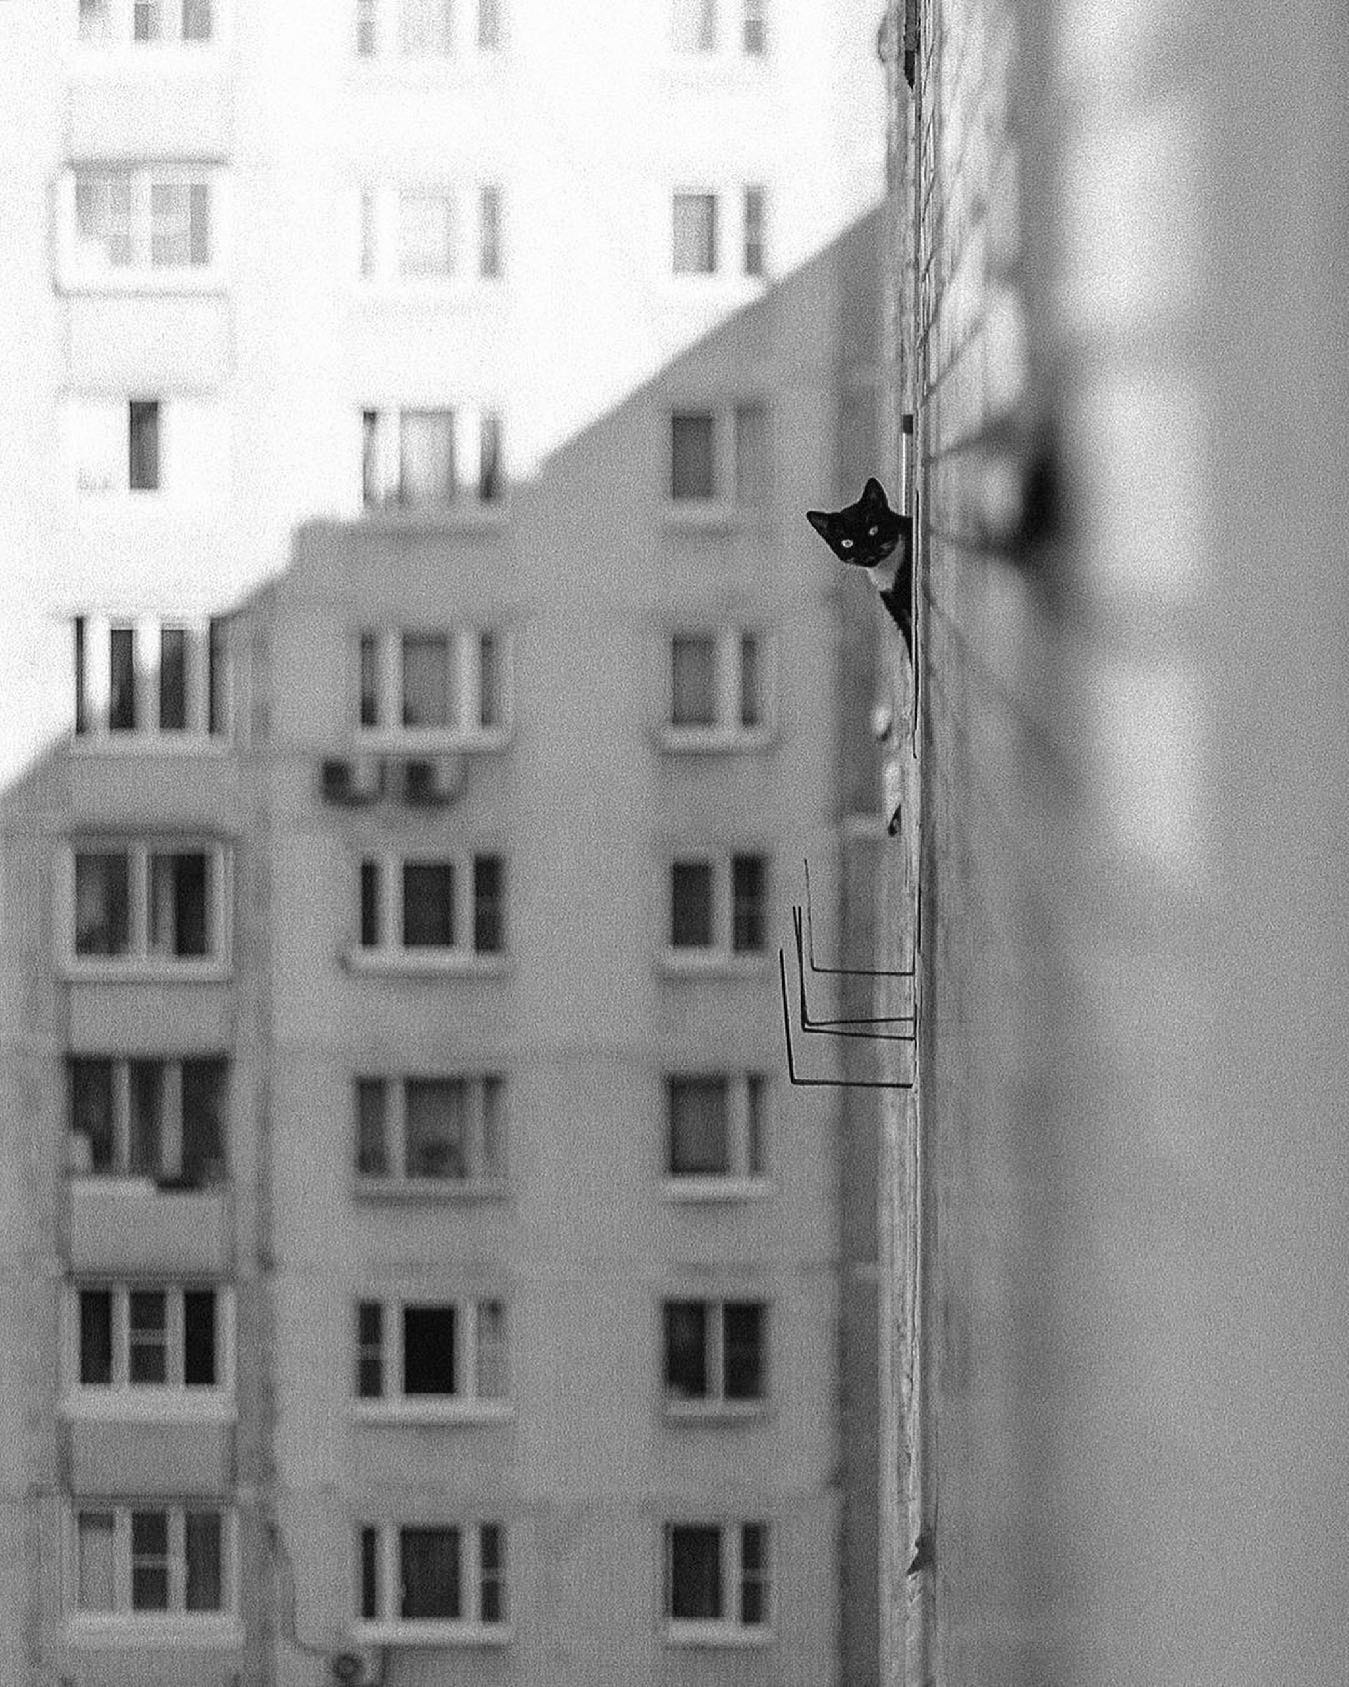 «Опасно». Москва, Марьино. Фотограф Виталий Зимарин